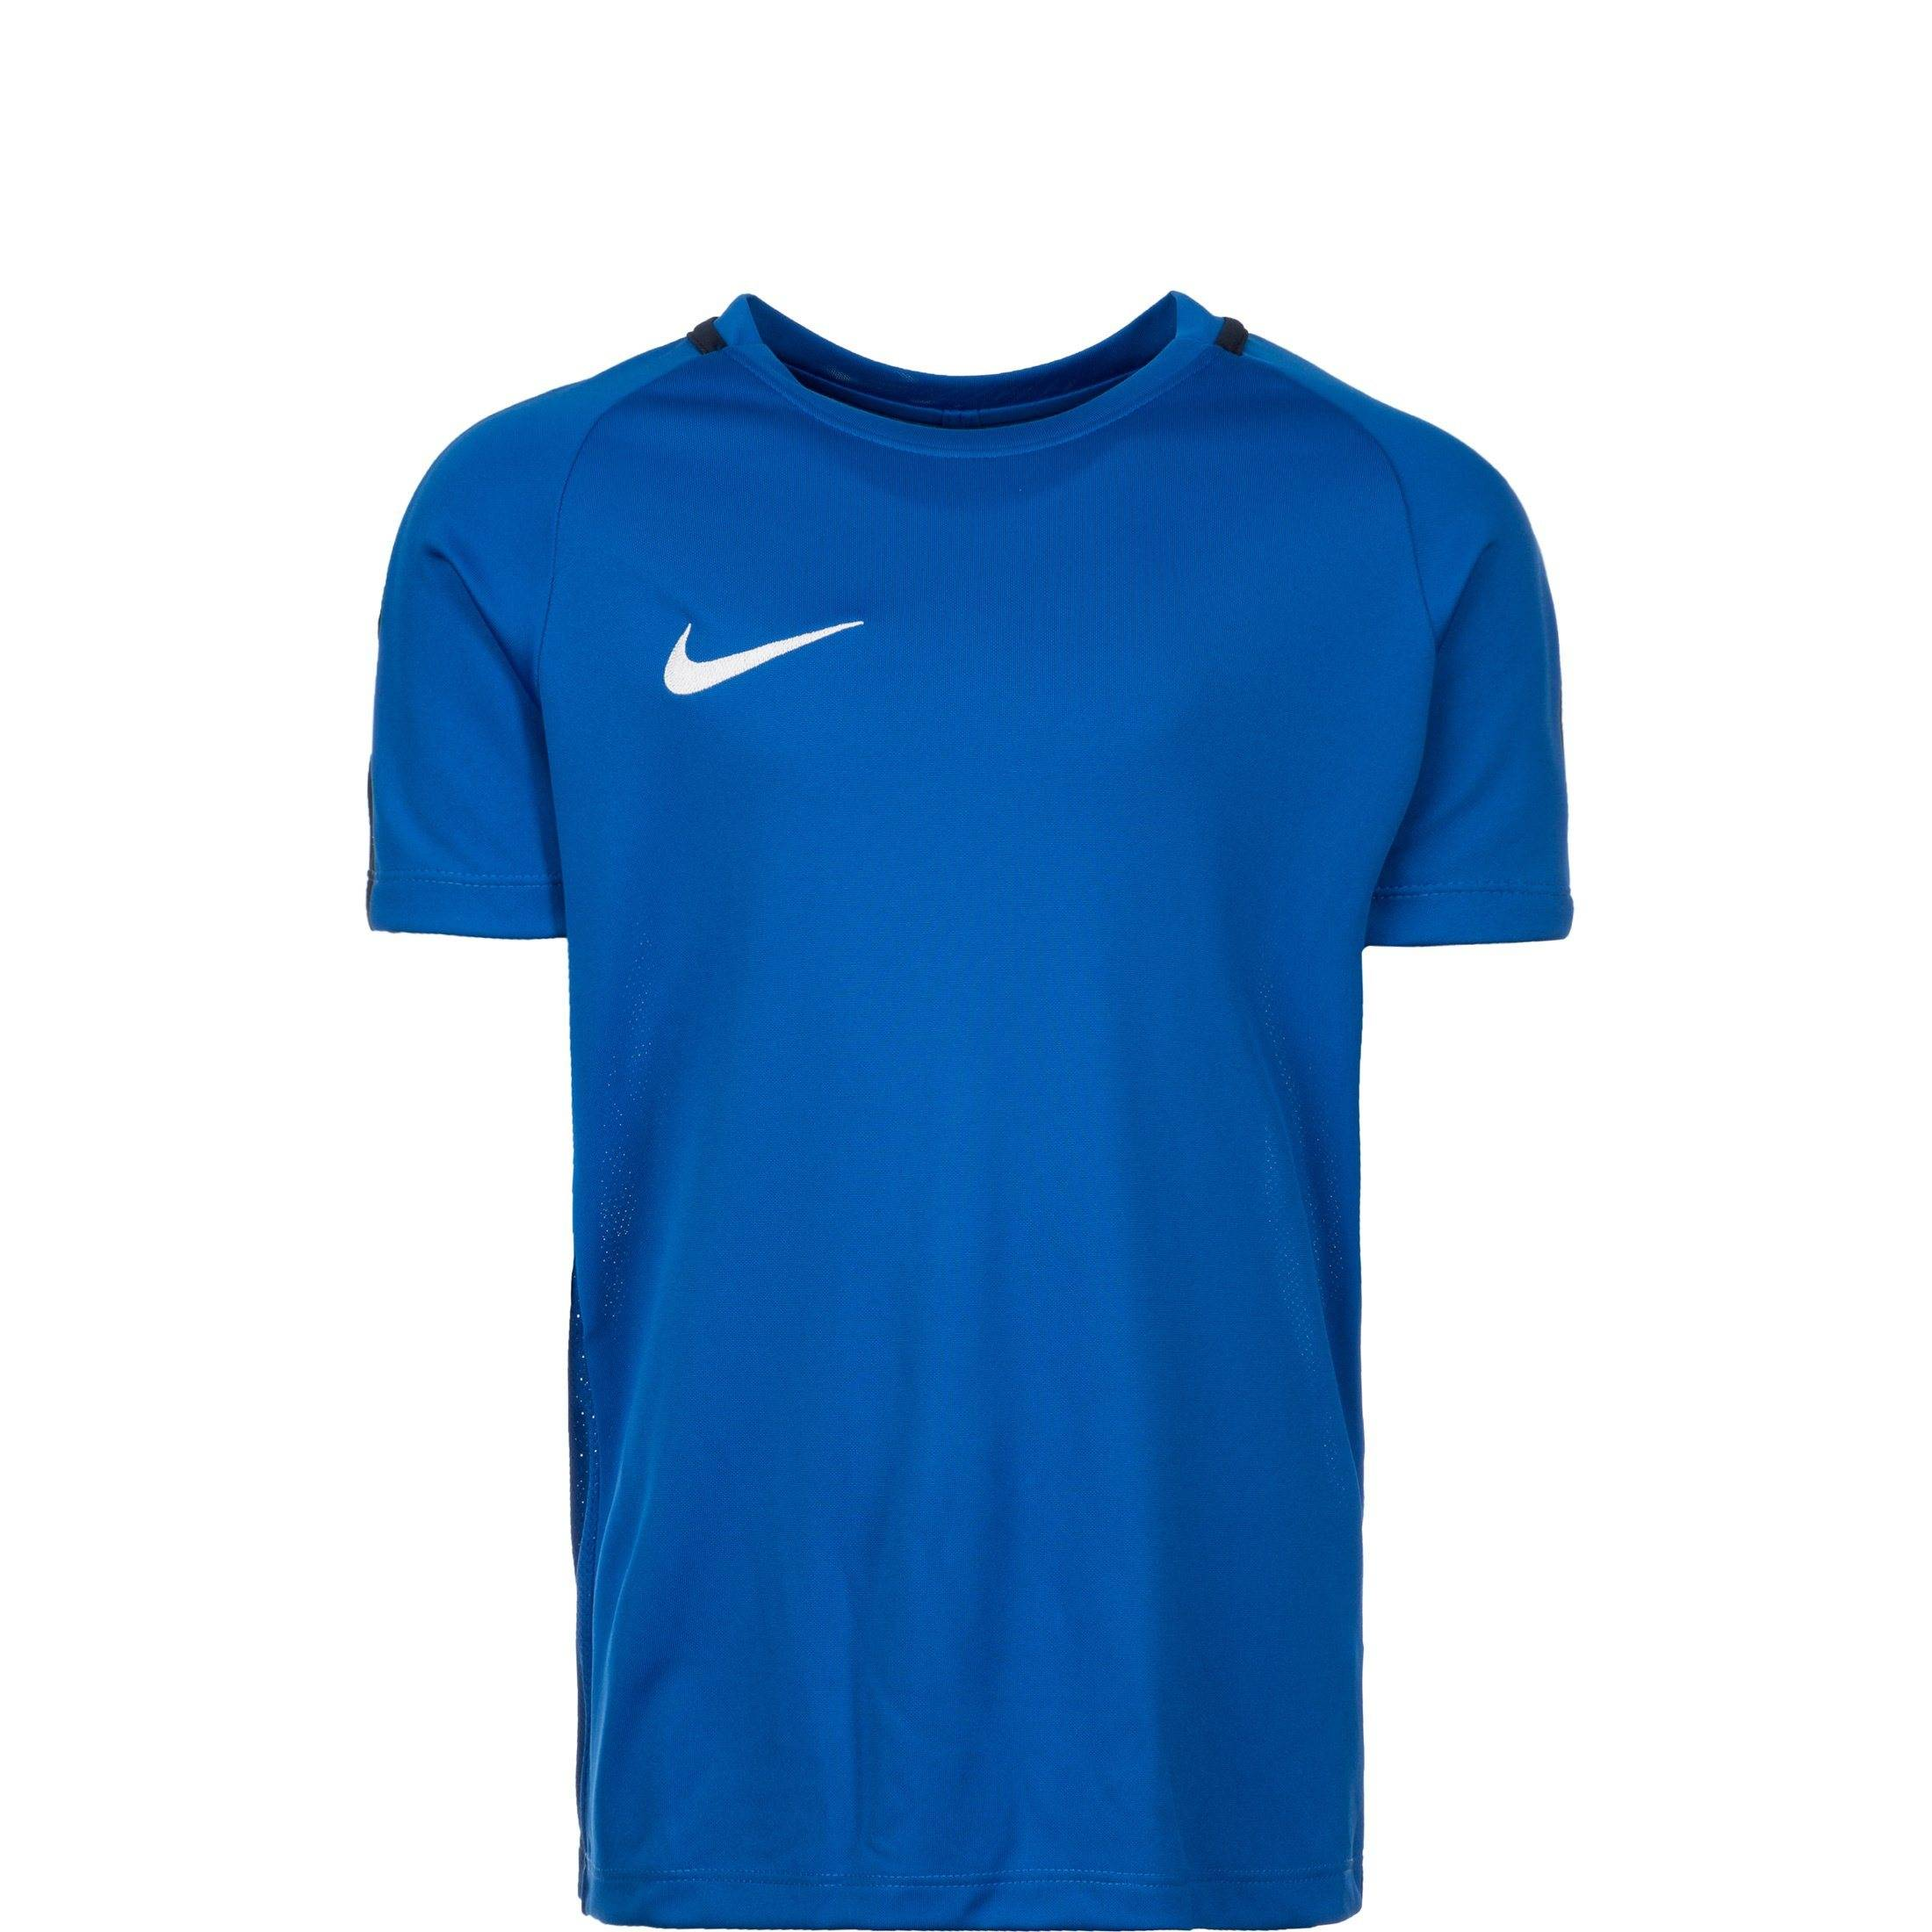 Nike Trainingsshirt »Dry Academy 18«, blau